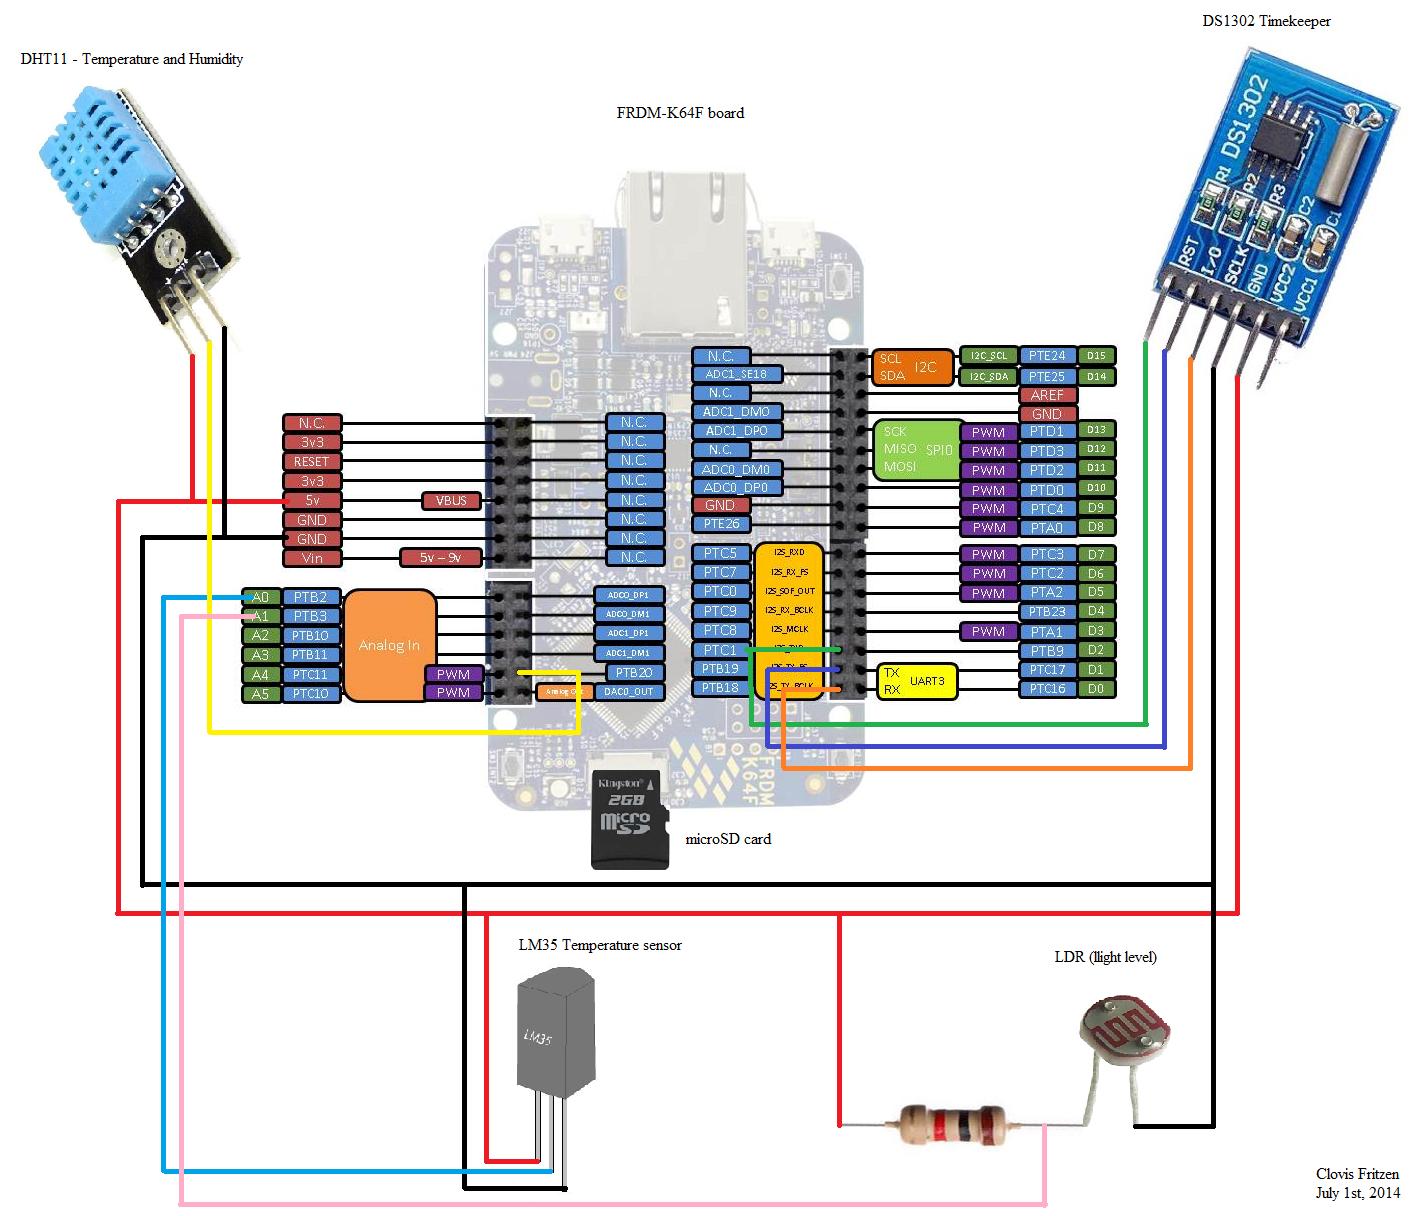 Ldr Sensor Arduino Library Iprototype Open Source Electronics A Cahaya Weather Station Datalogger Using Arm Cortex M